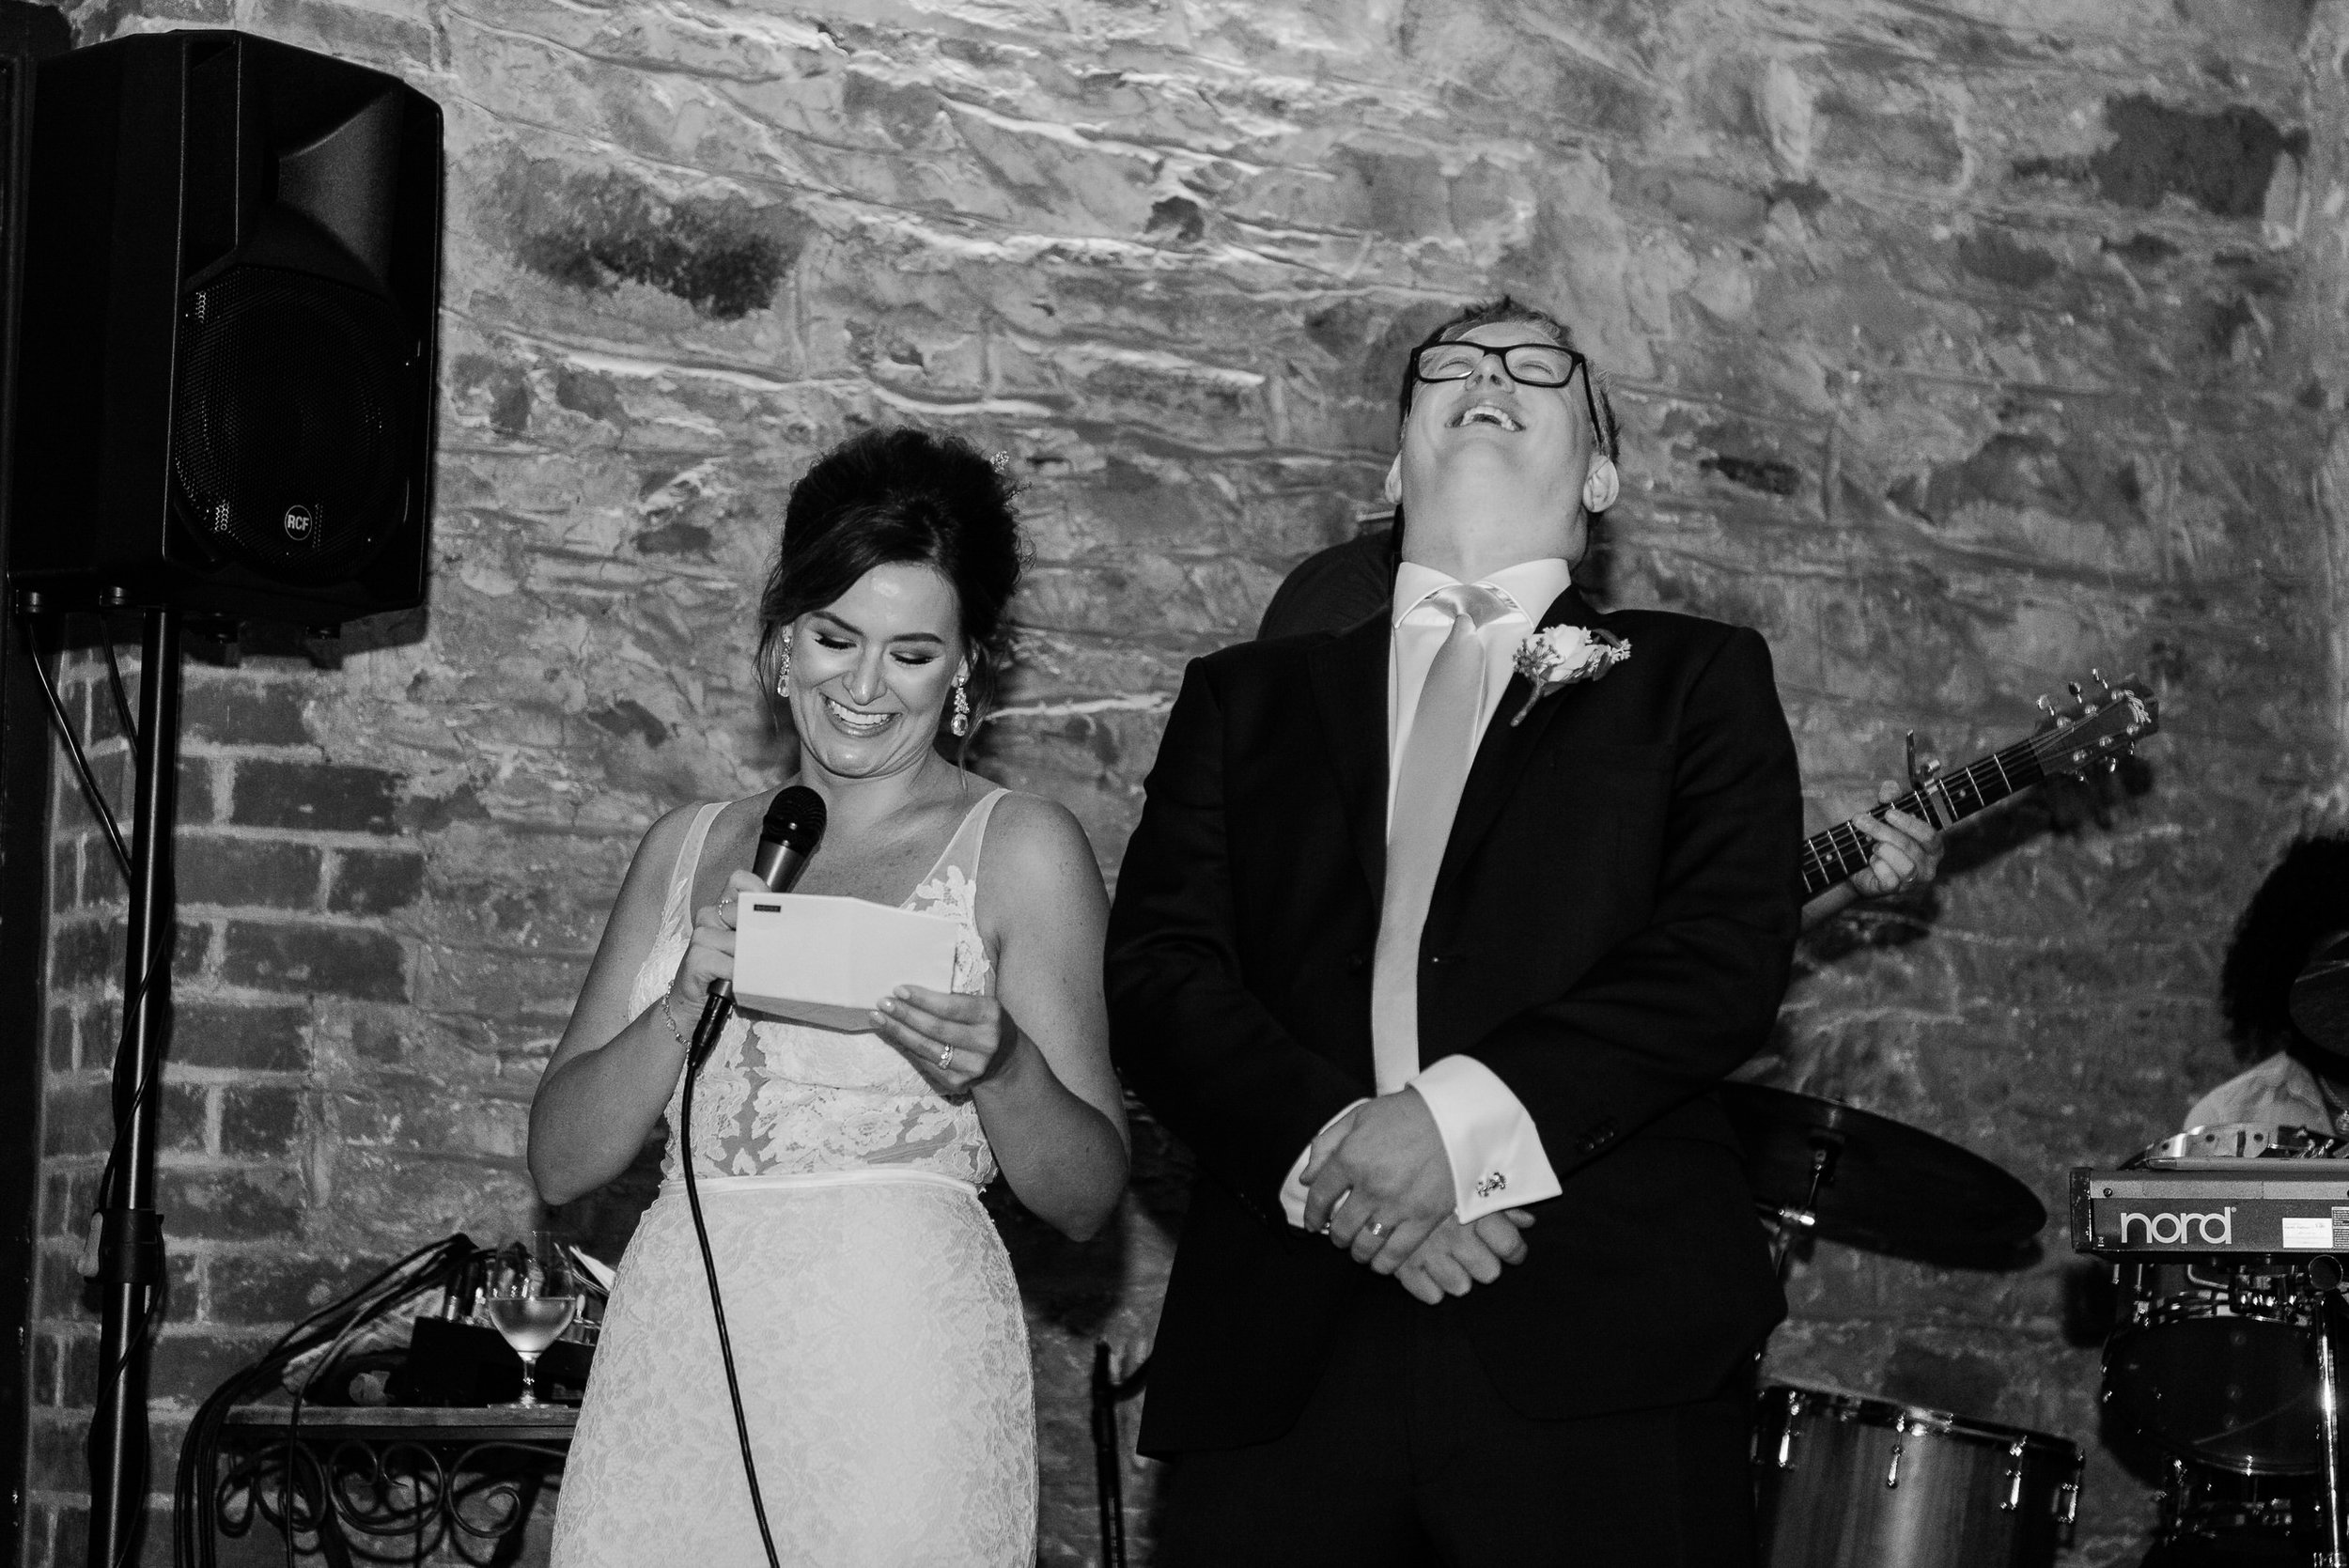 Justin_And_Jim_Photography_Chateau_Dore_Bendigo_Wedding93.JPG